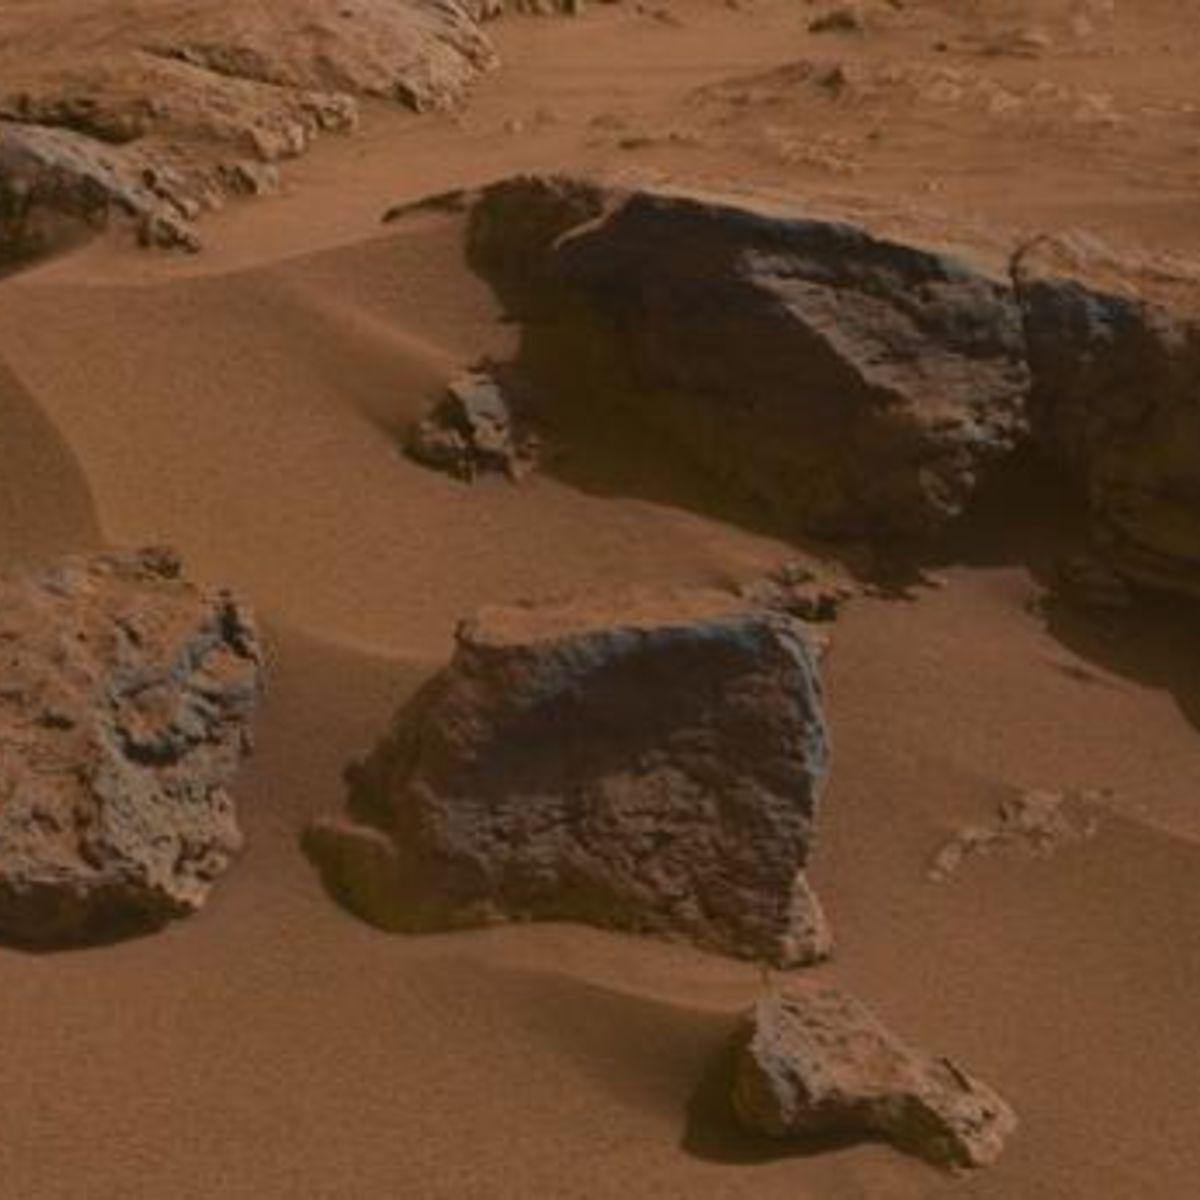 curiosity_rocks_sand.jpg.CROP.rectangle-large.jpg